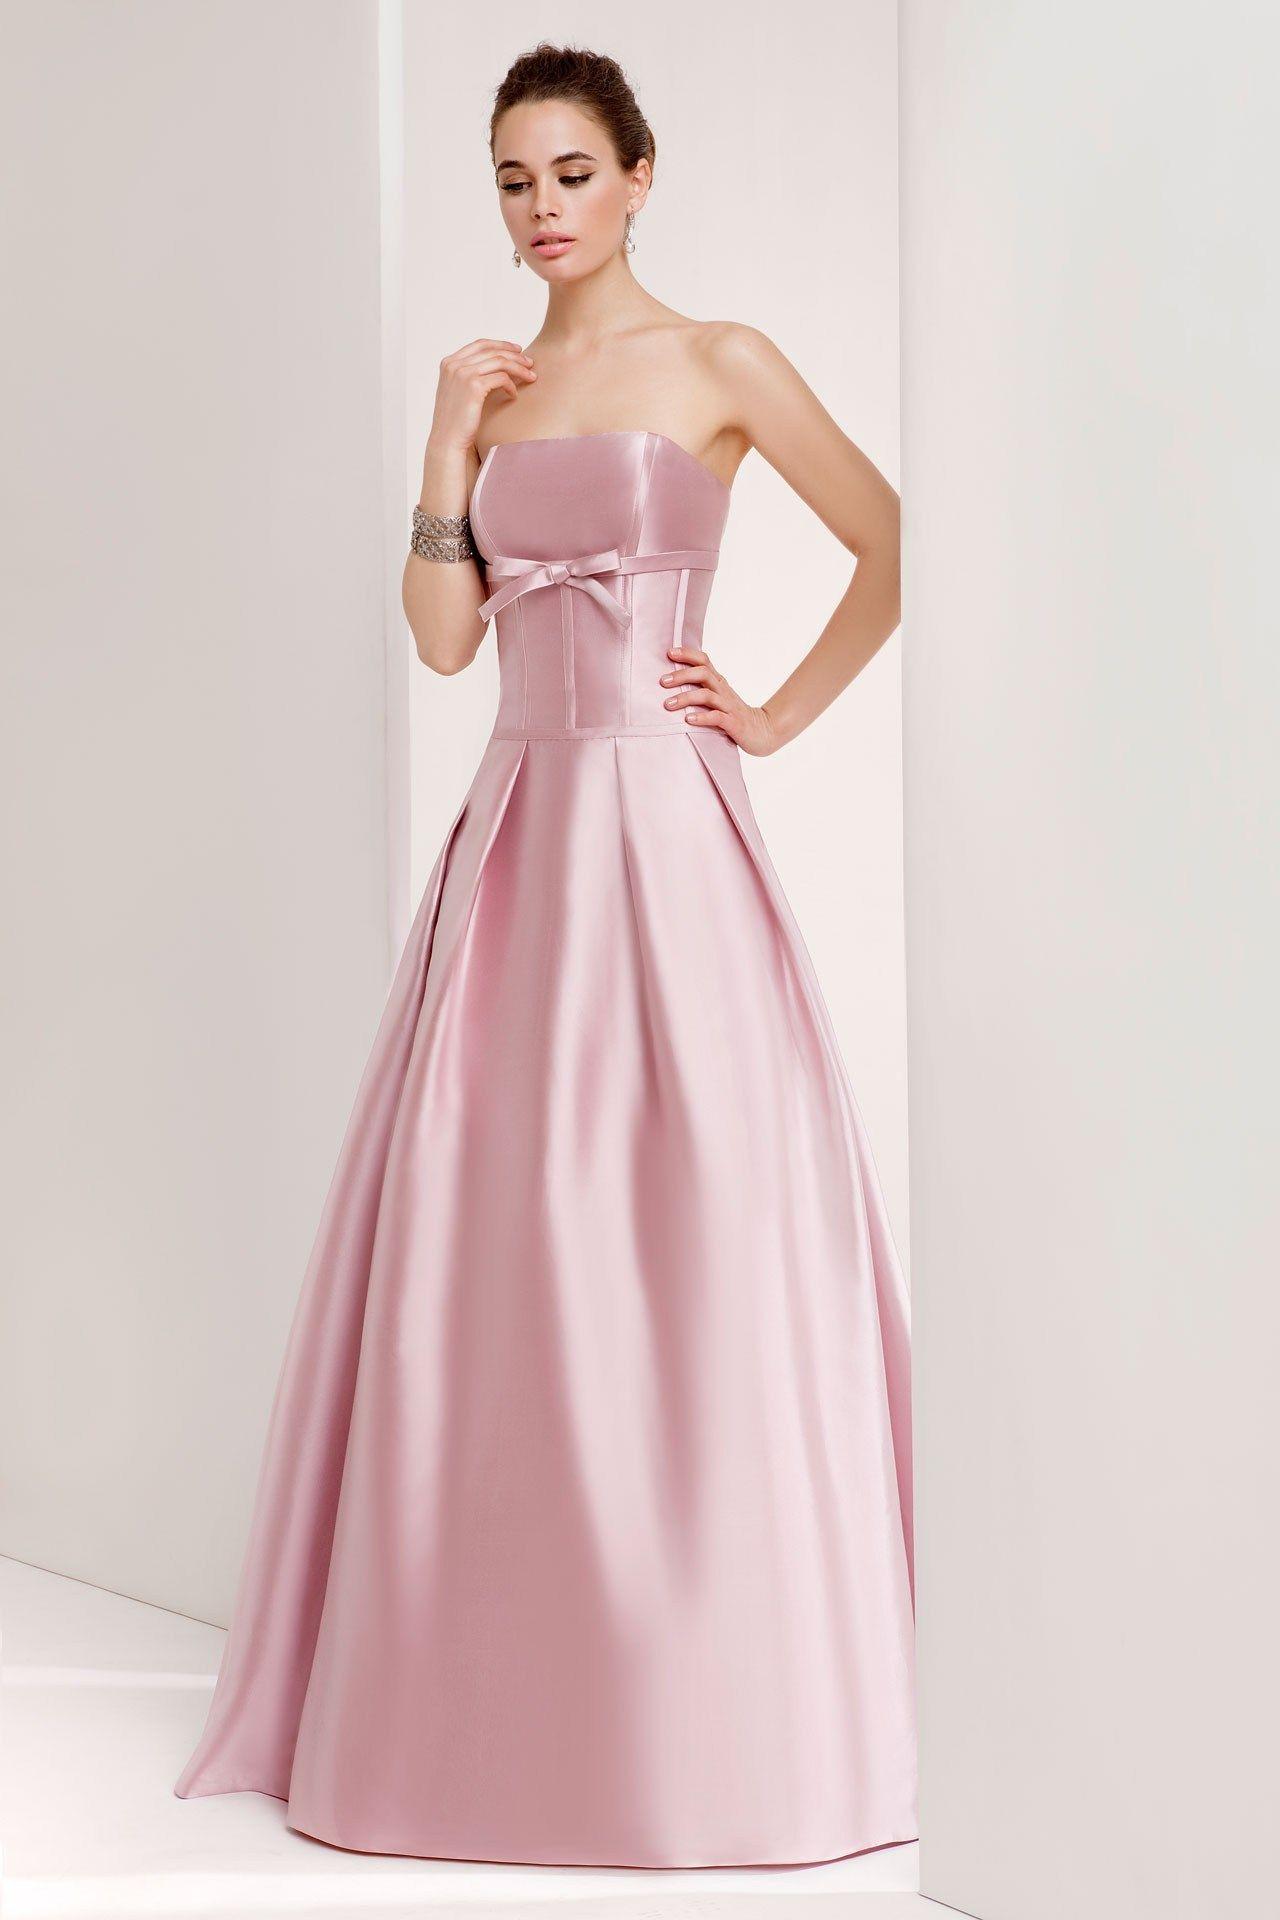 Wedding Dresses - The Ultimate Gallery (BridesMagazine.co.uk) | Boda ...